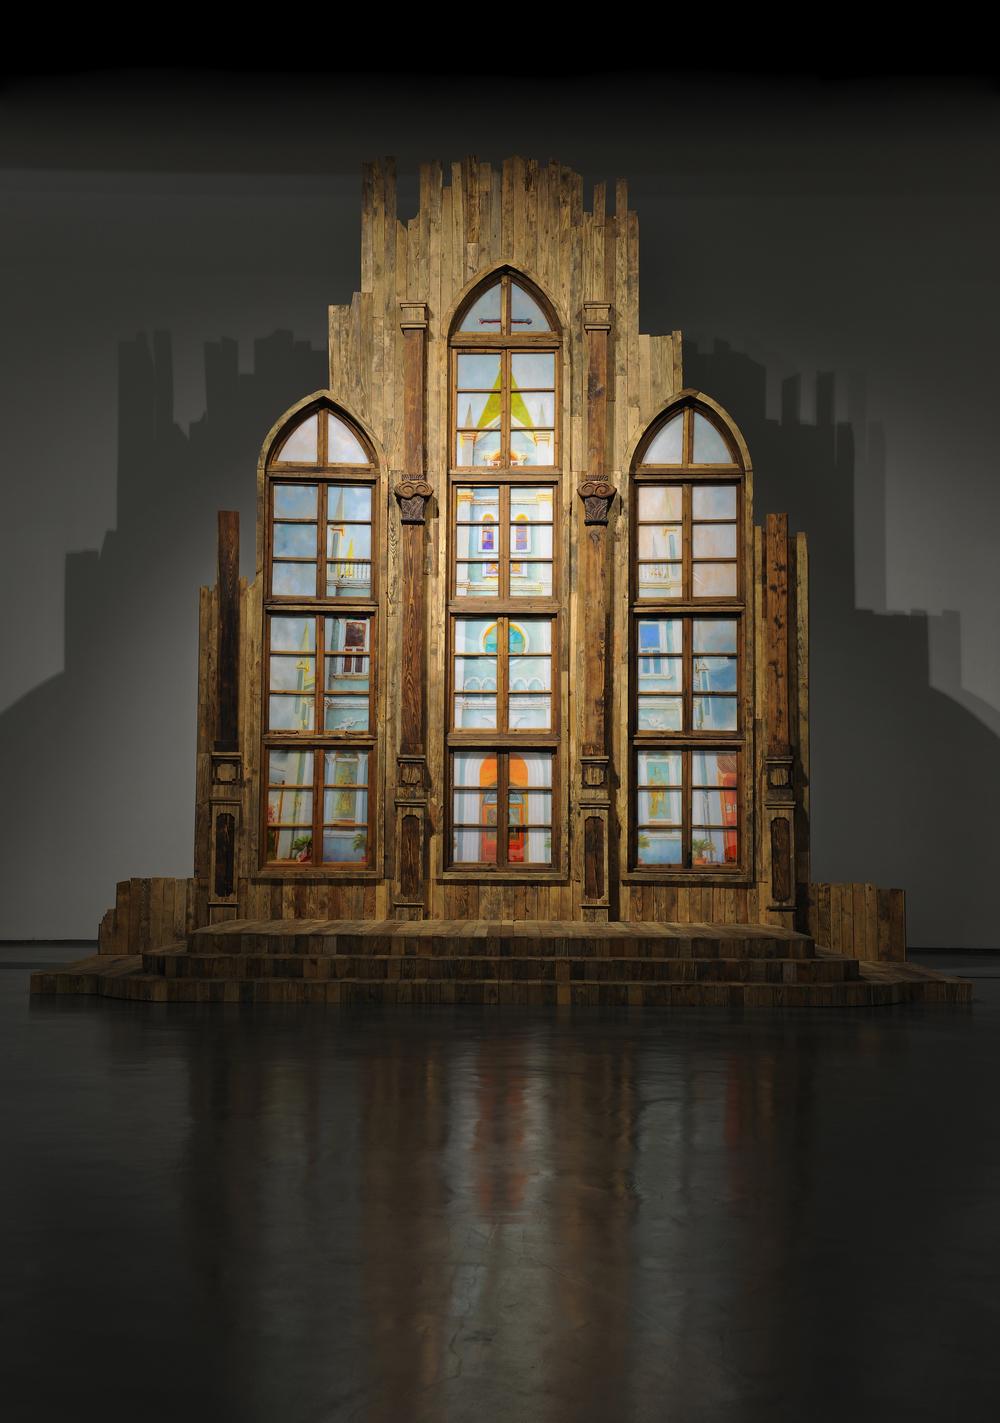 Li Qing 李青, Rural Church 乡村教堂, 2014-2015, Wood,oil on plexiglass, metal 木、有机玻璃、金属、油彩, 600 x 560 x 500 cm